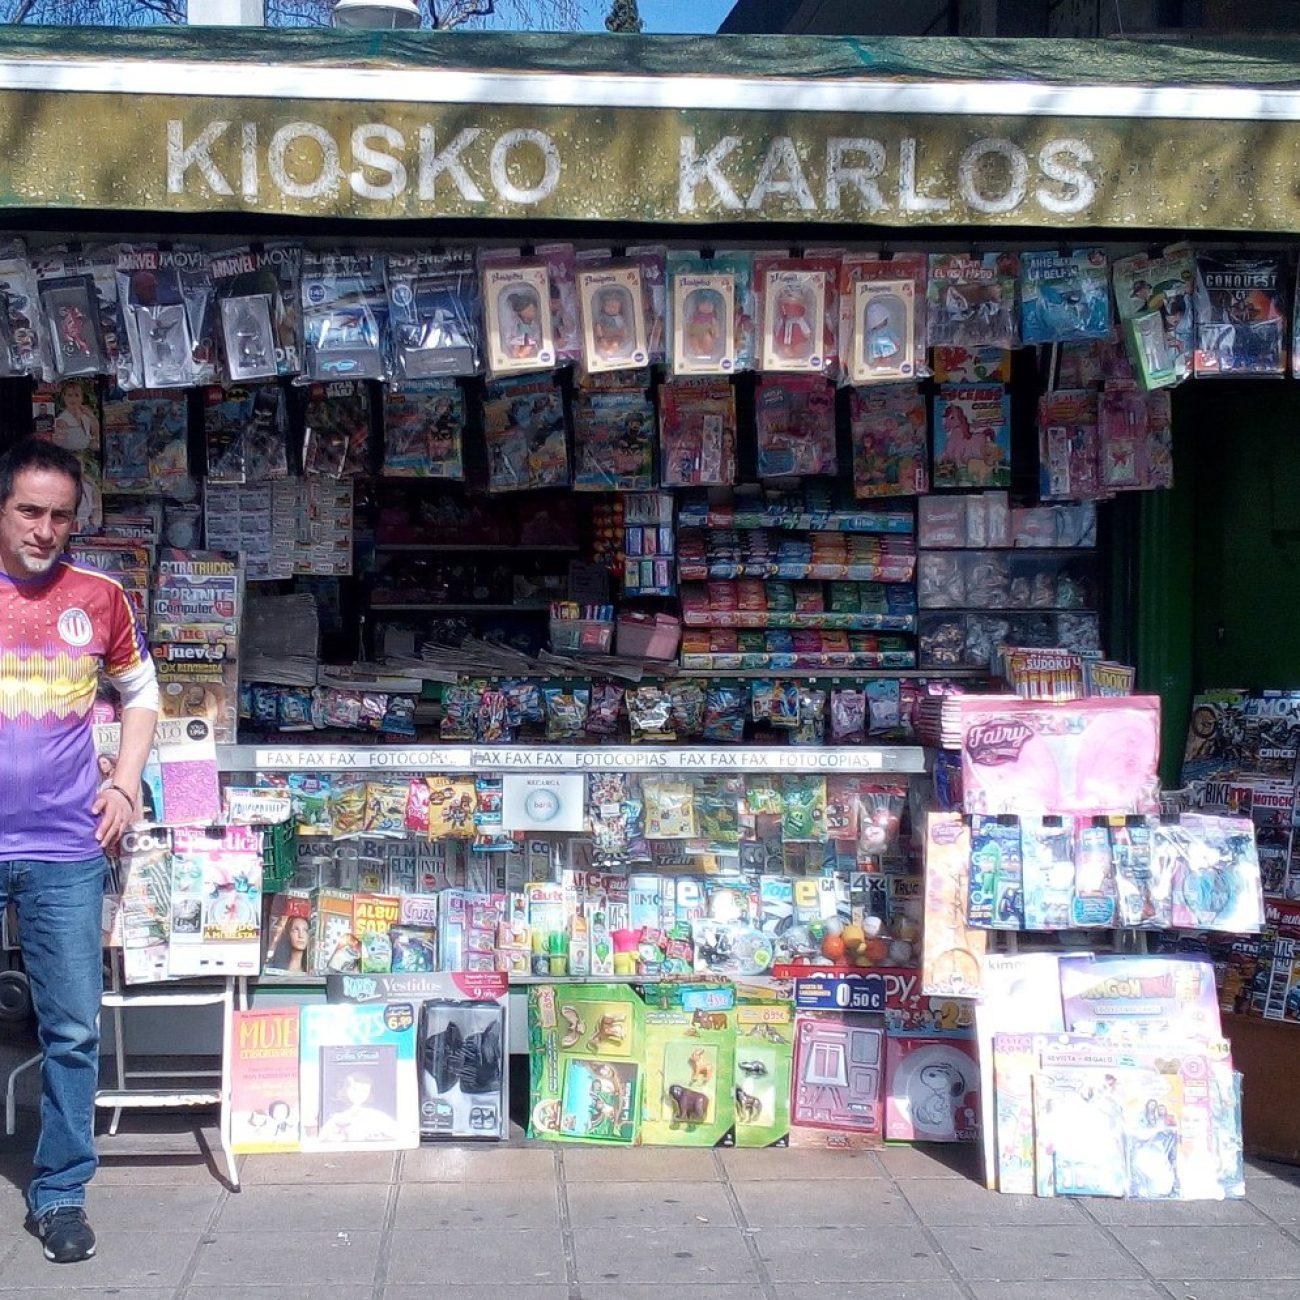 KIOSKO KARLOS